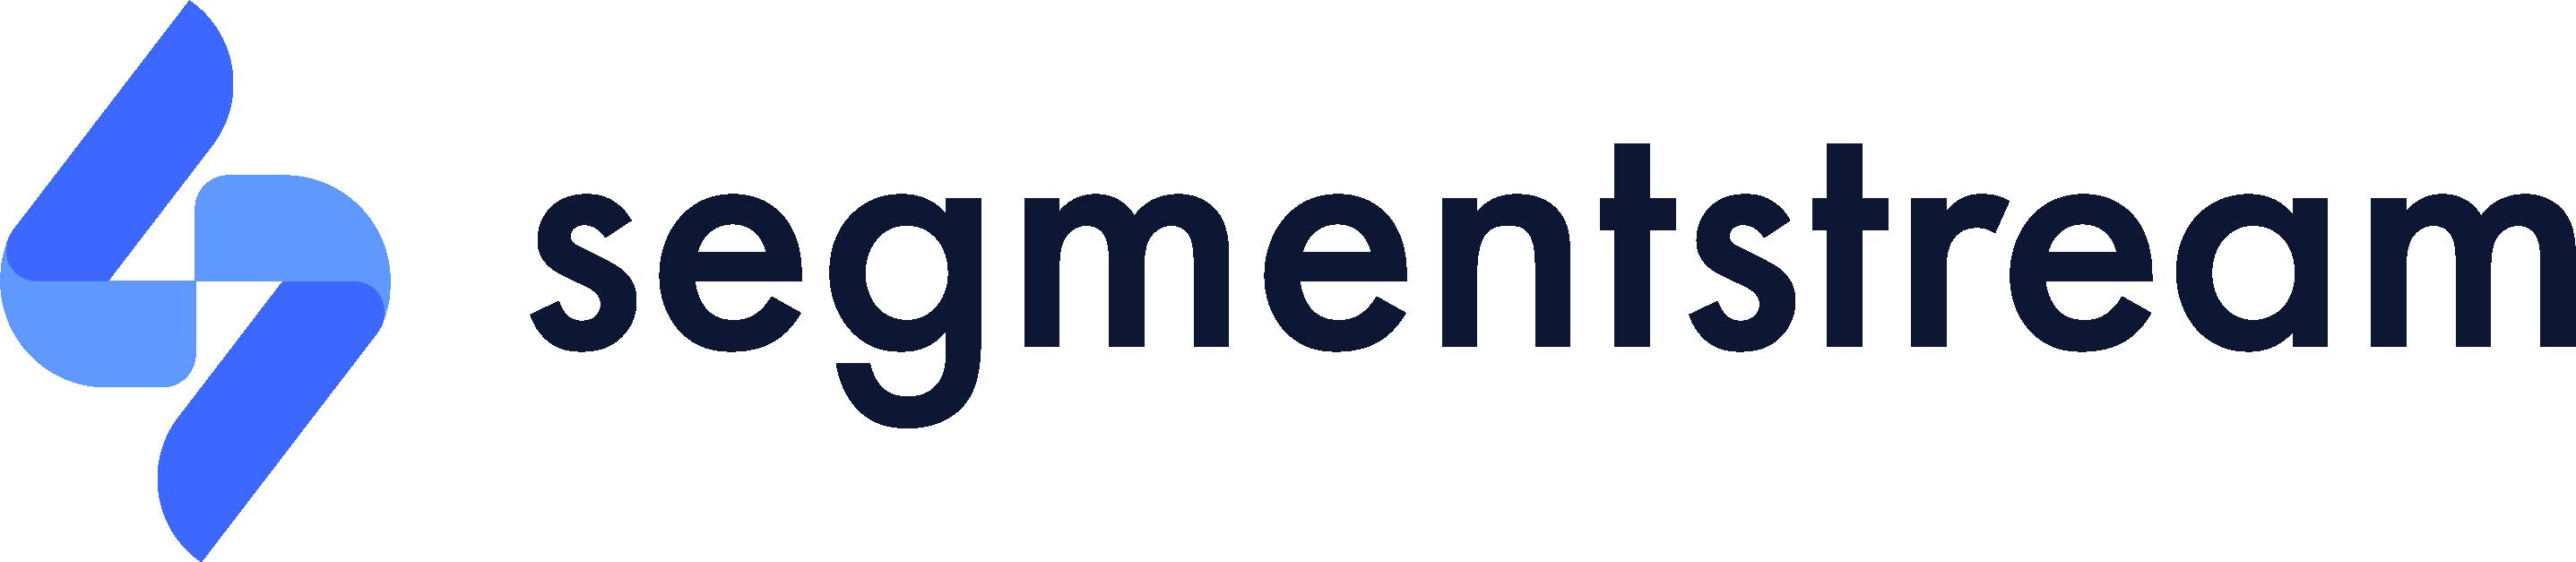 SegementStream